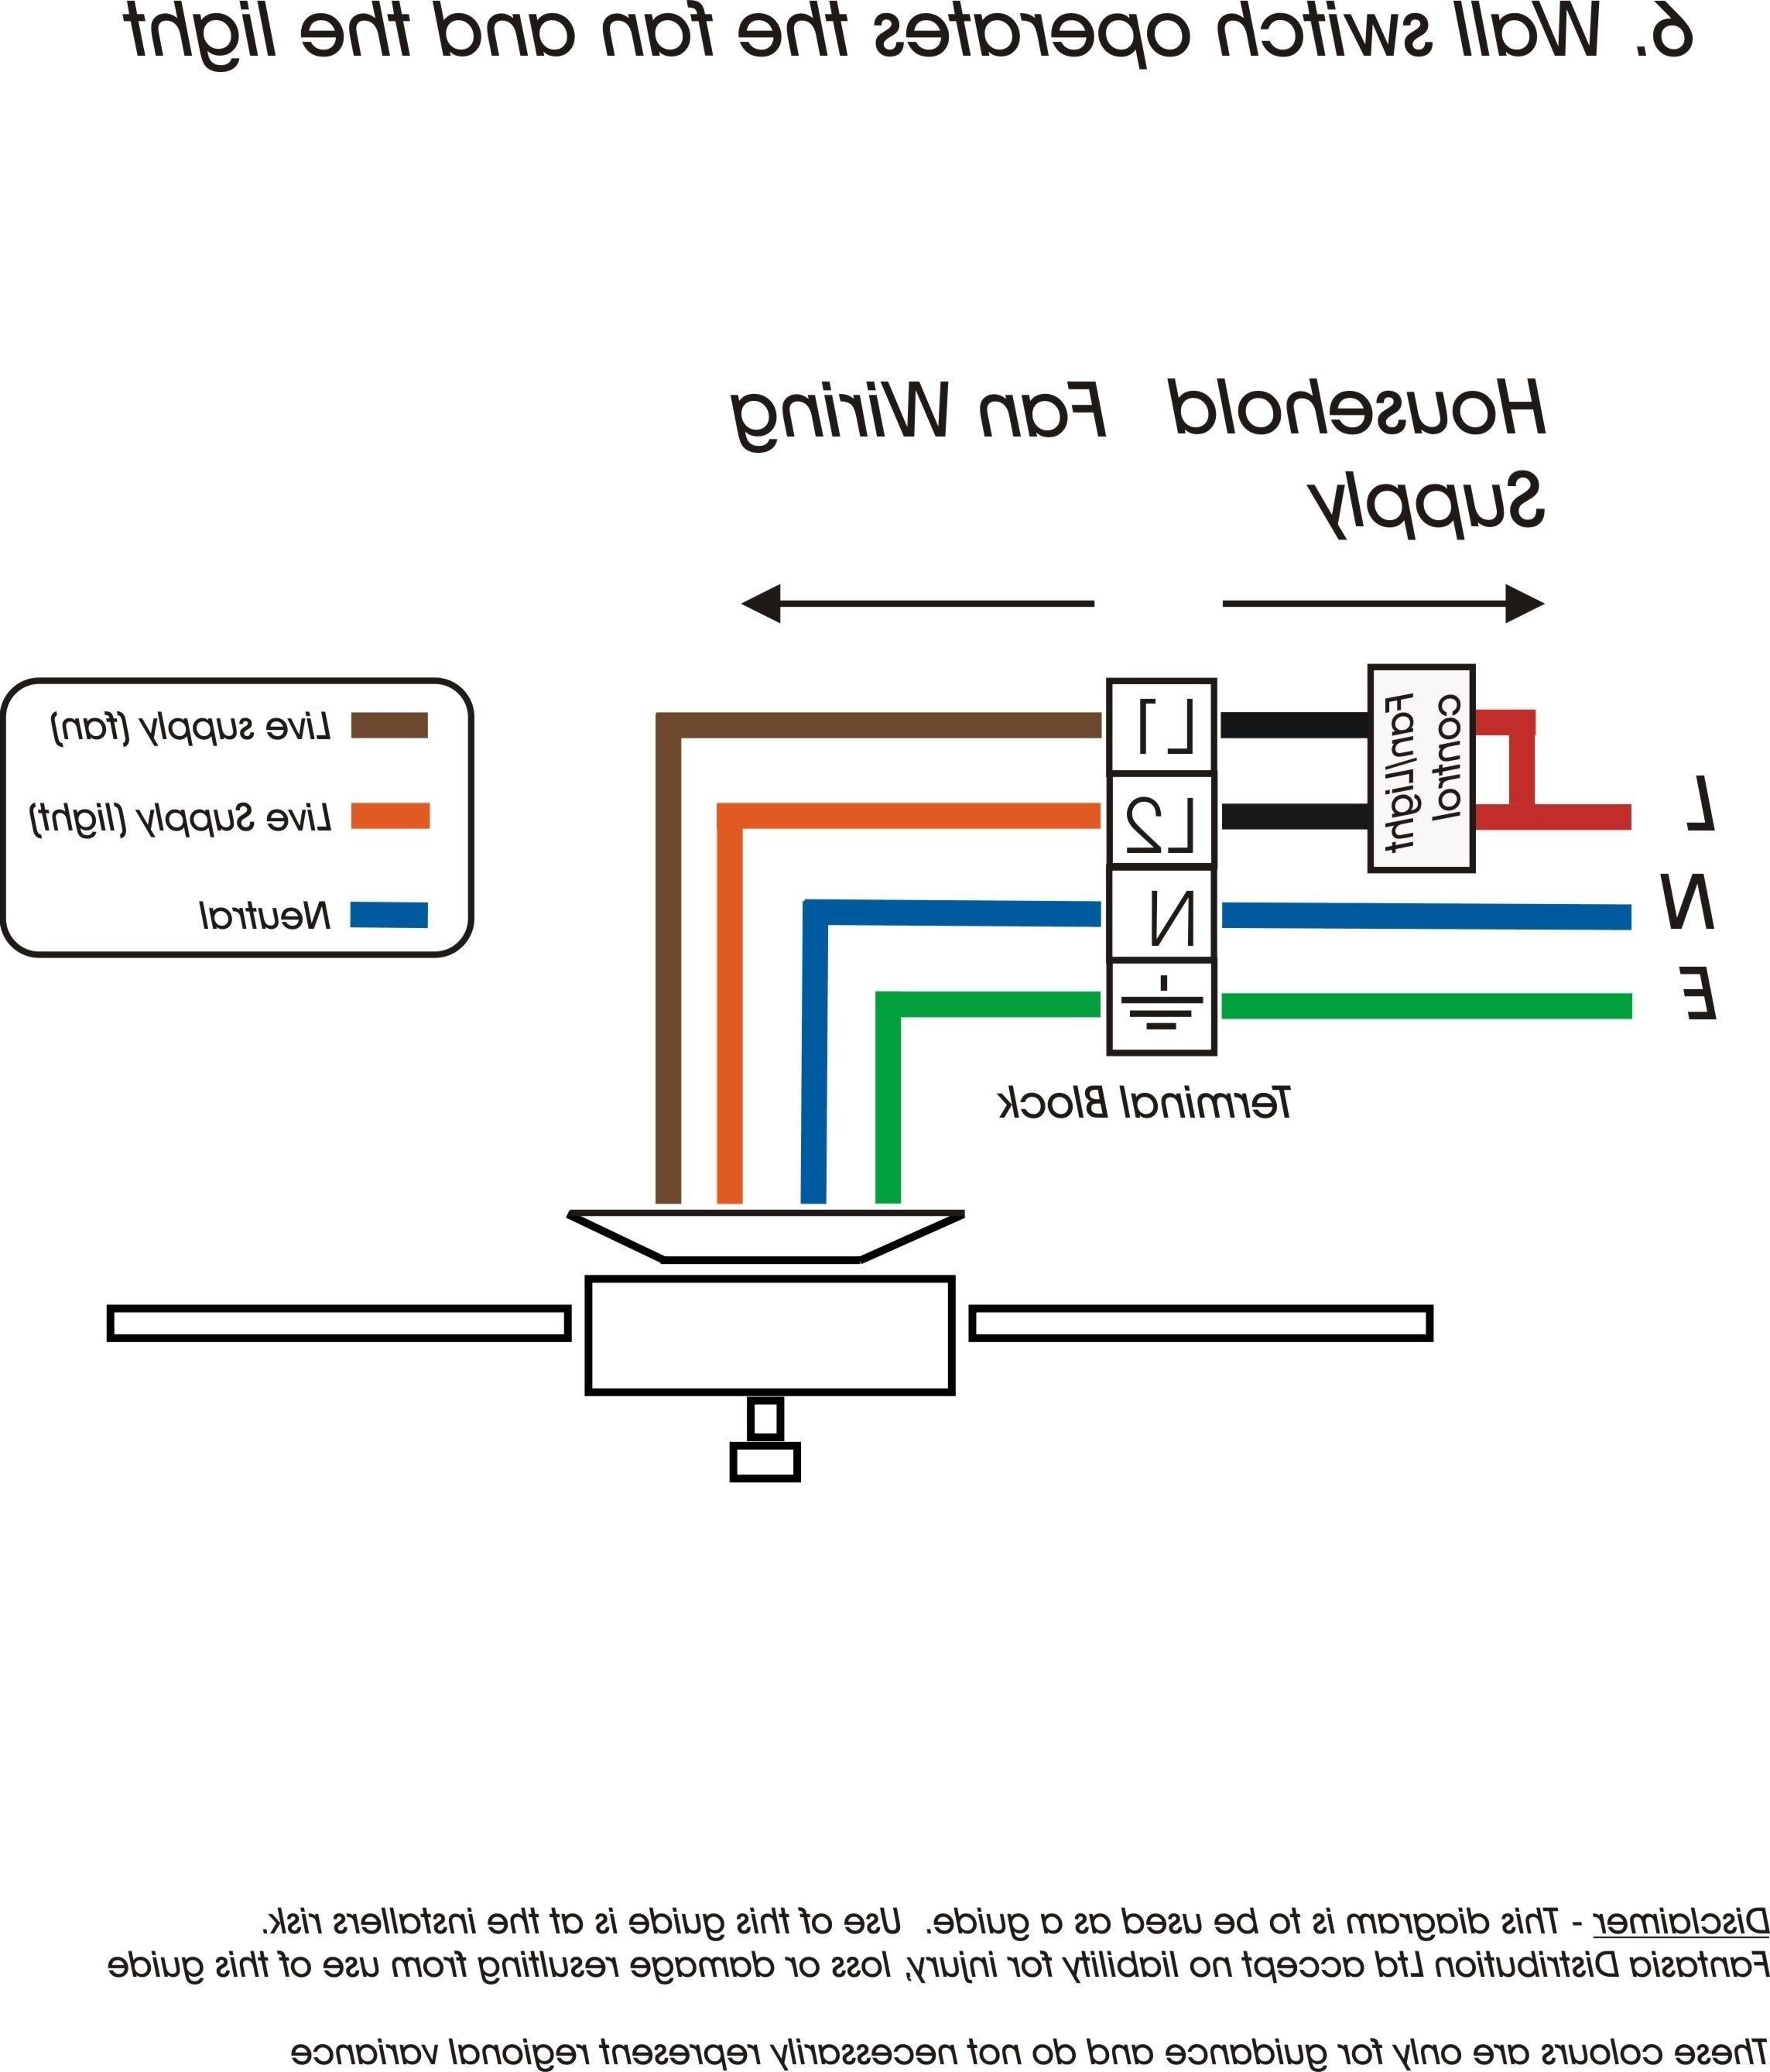 Electric Water Heater Wiring Diagram Rheem Hot Water Heater Wiring Diagram Fresh Wiring Diagram Water Of Electric Water Heater Wiring Diagram